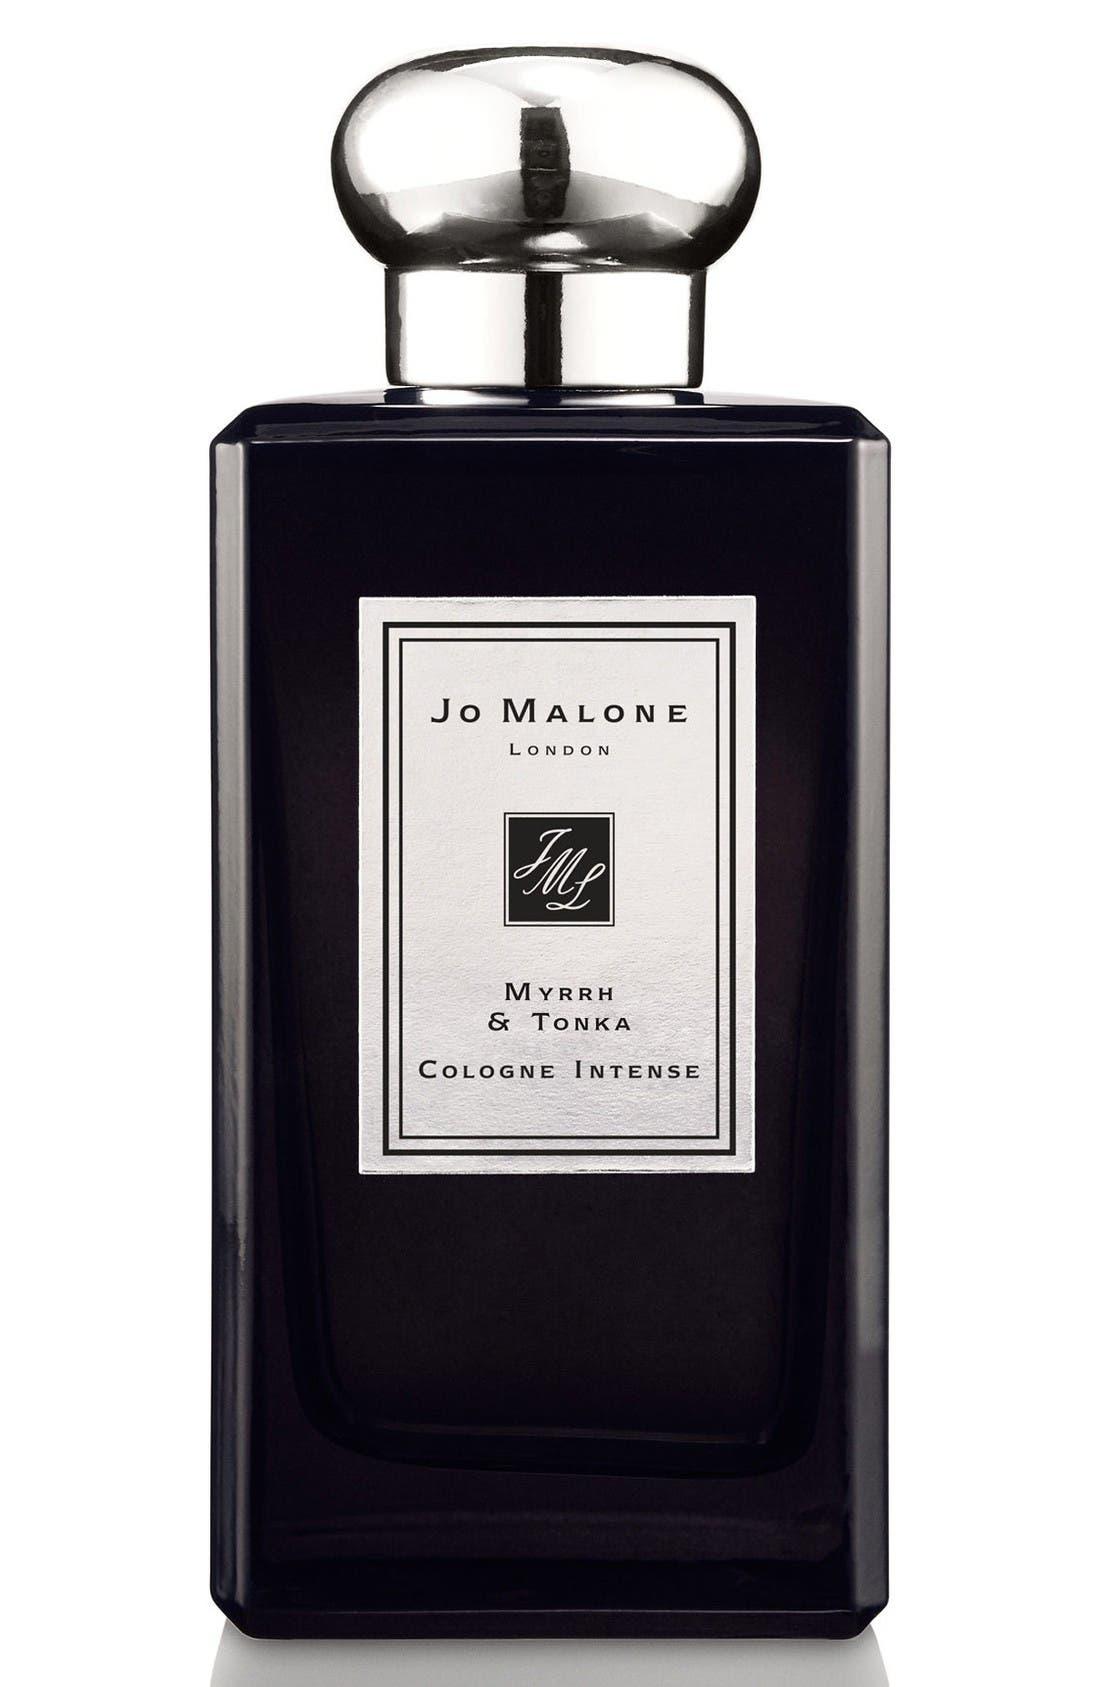 Jo Malone London™ Myrrh & Tonka Cologne Intense